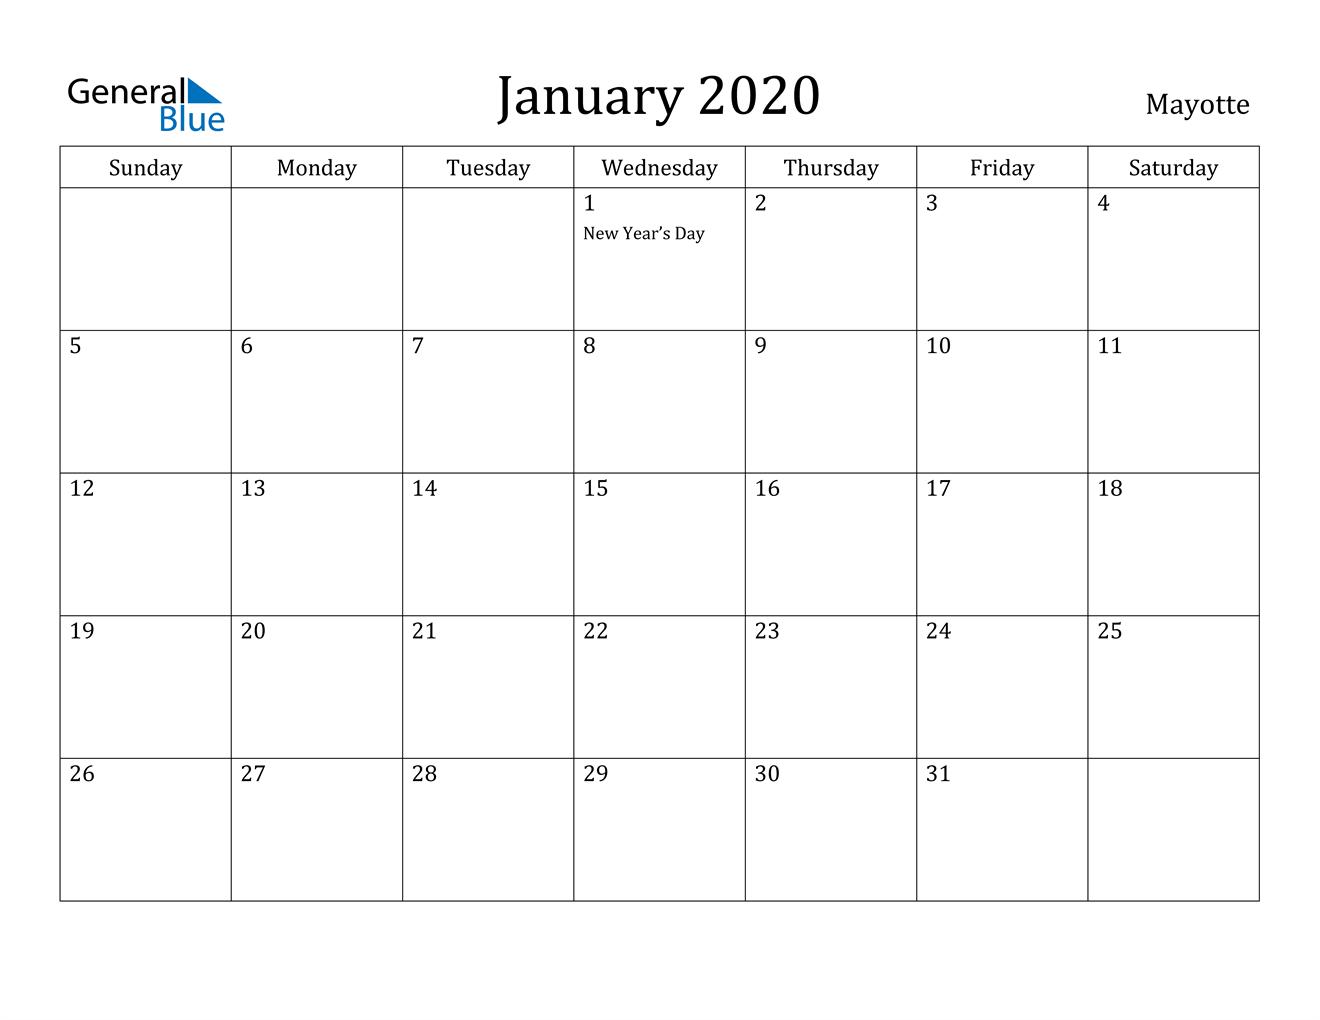 Image of January 2020 Mayotte Calendar with Holidays Calendar